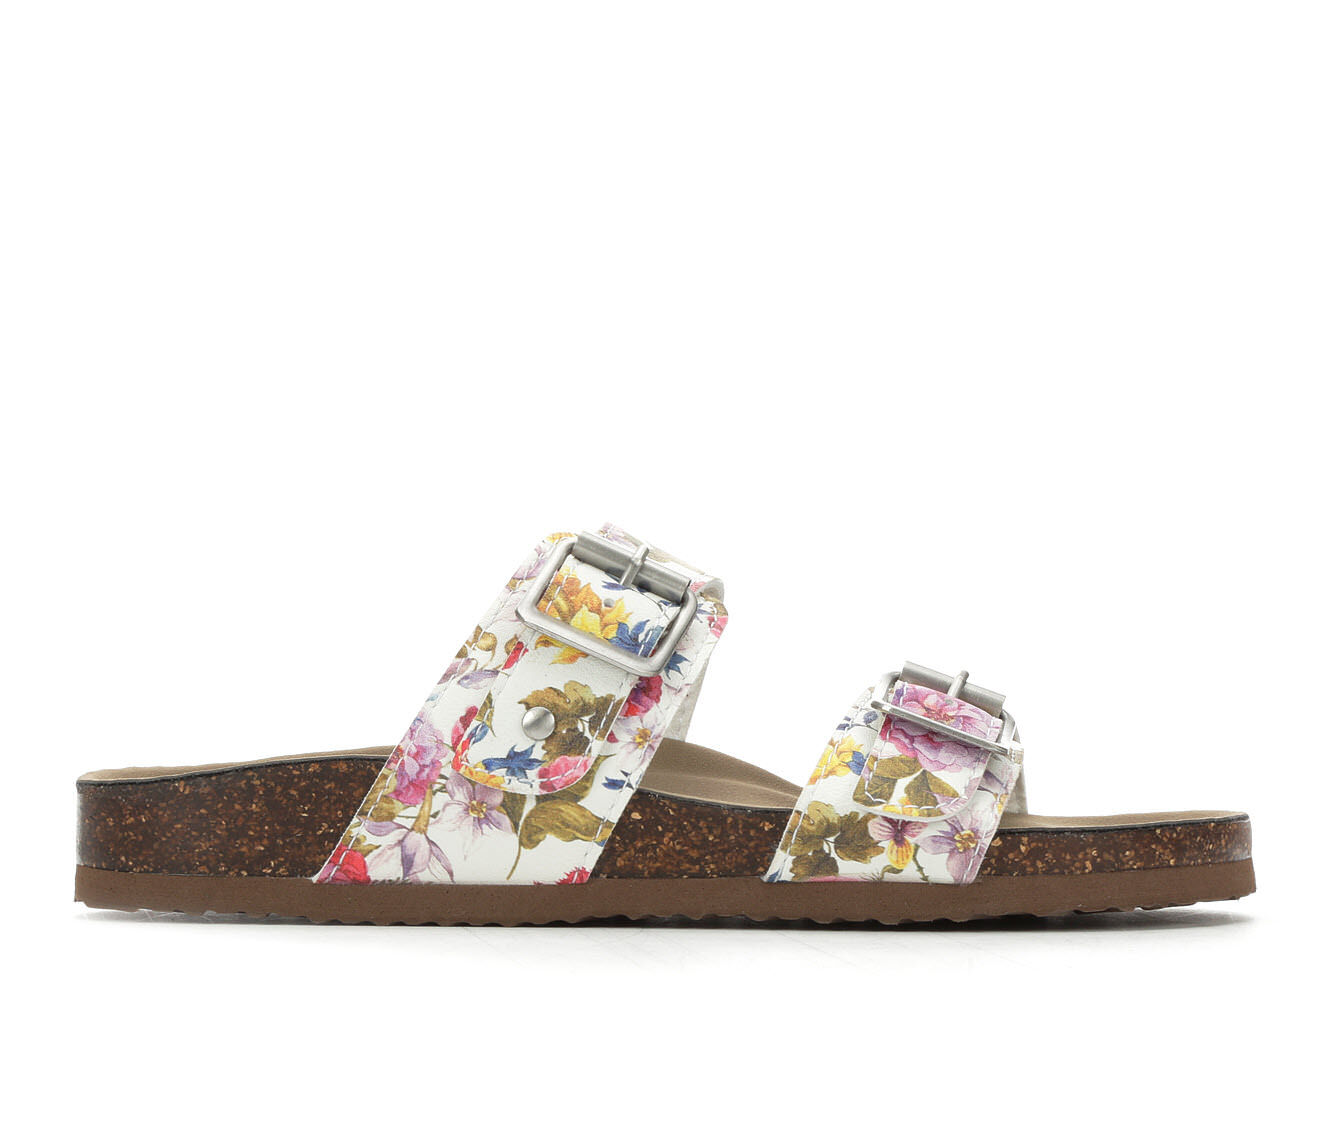 Purchase Price Women's Madden Girl Brando Footbed Sandals Whiteflower PU